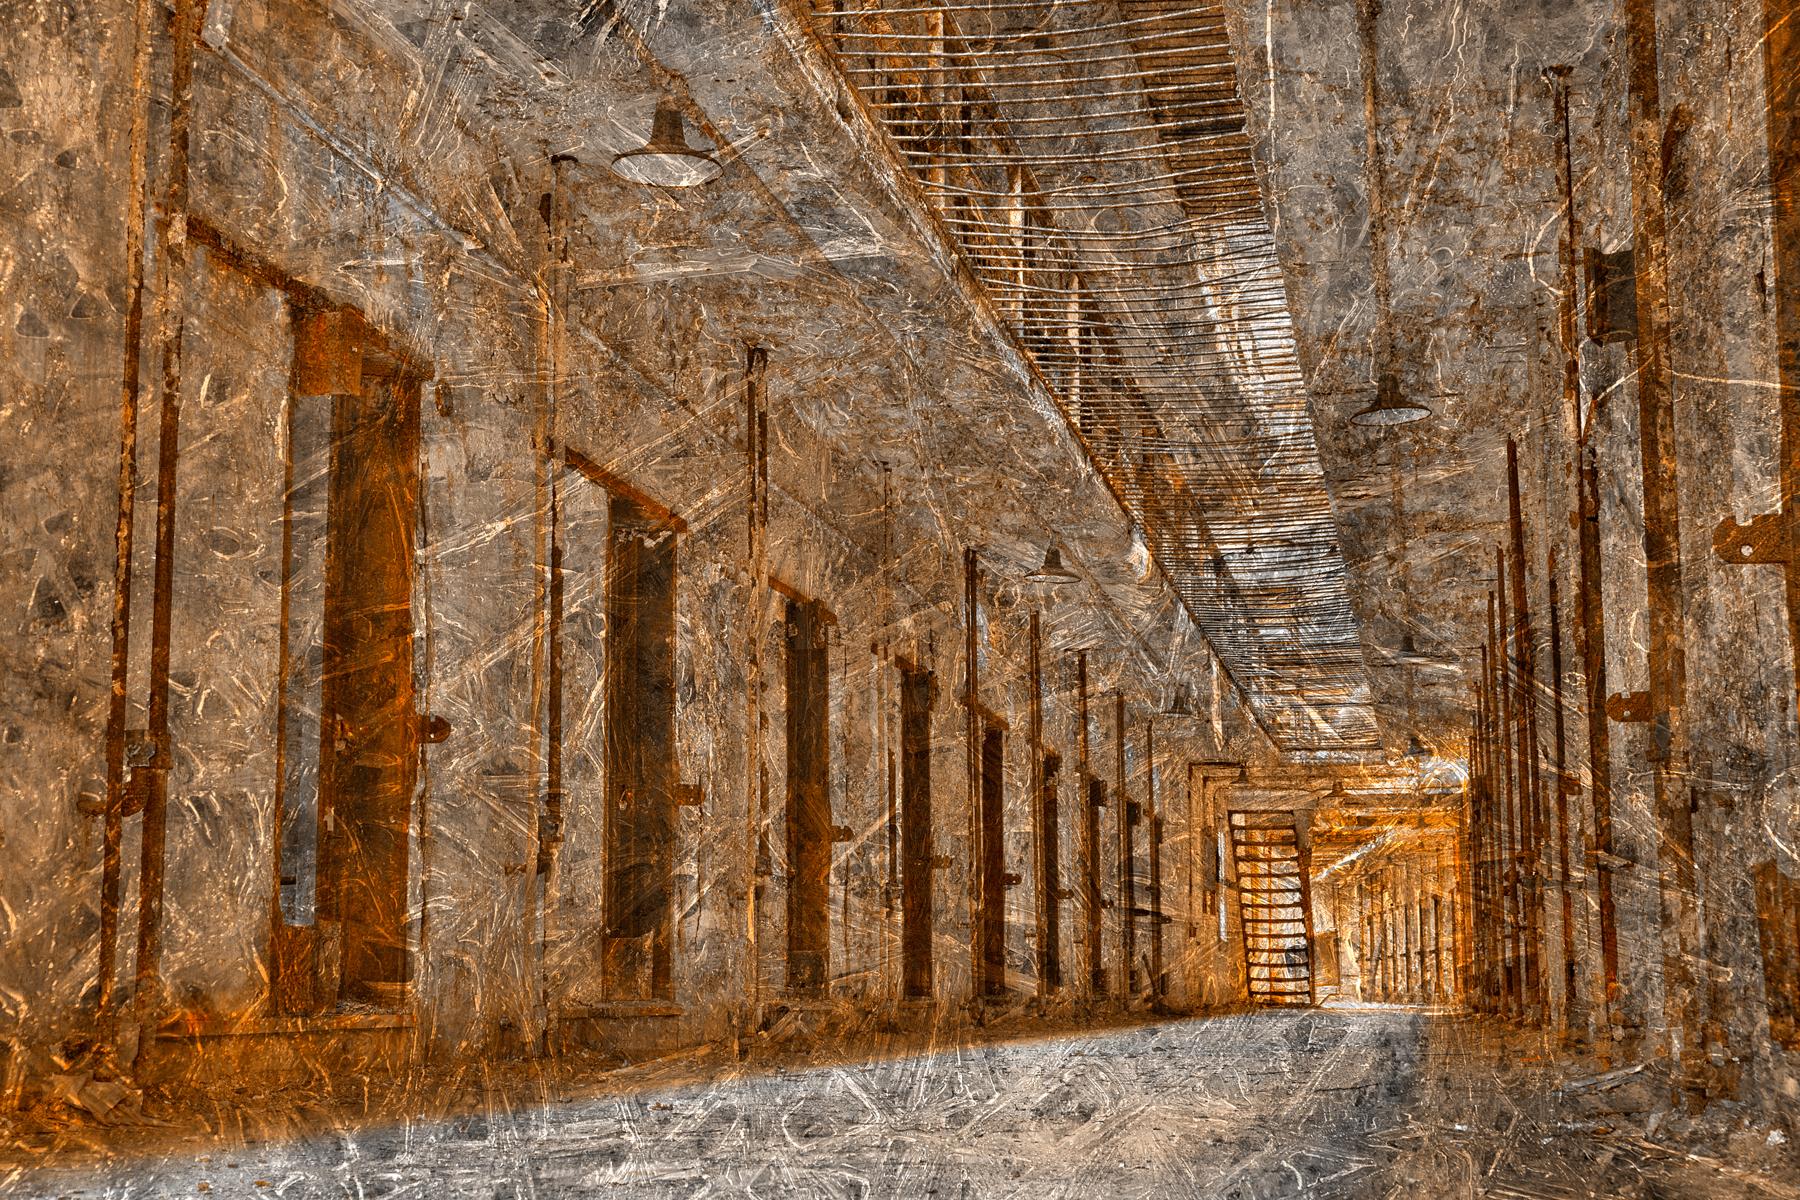 Shattered Prison Corridor, Abandoned, Peeling, Rough, Retro, HQ Photo